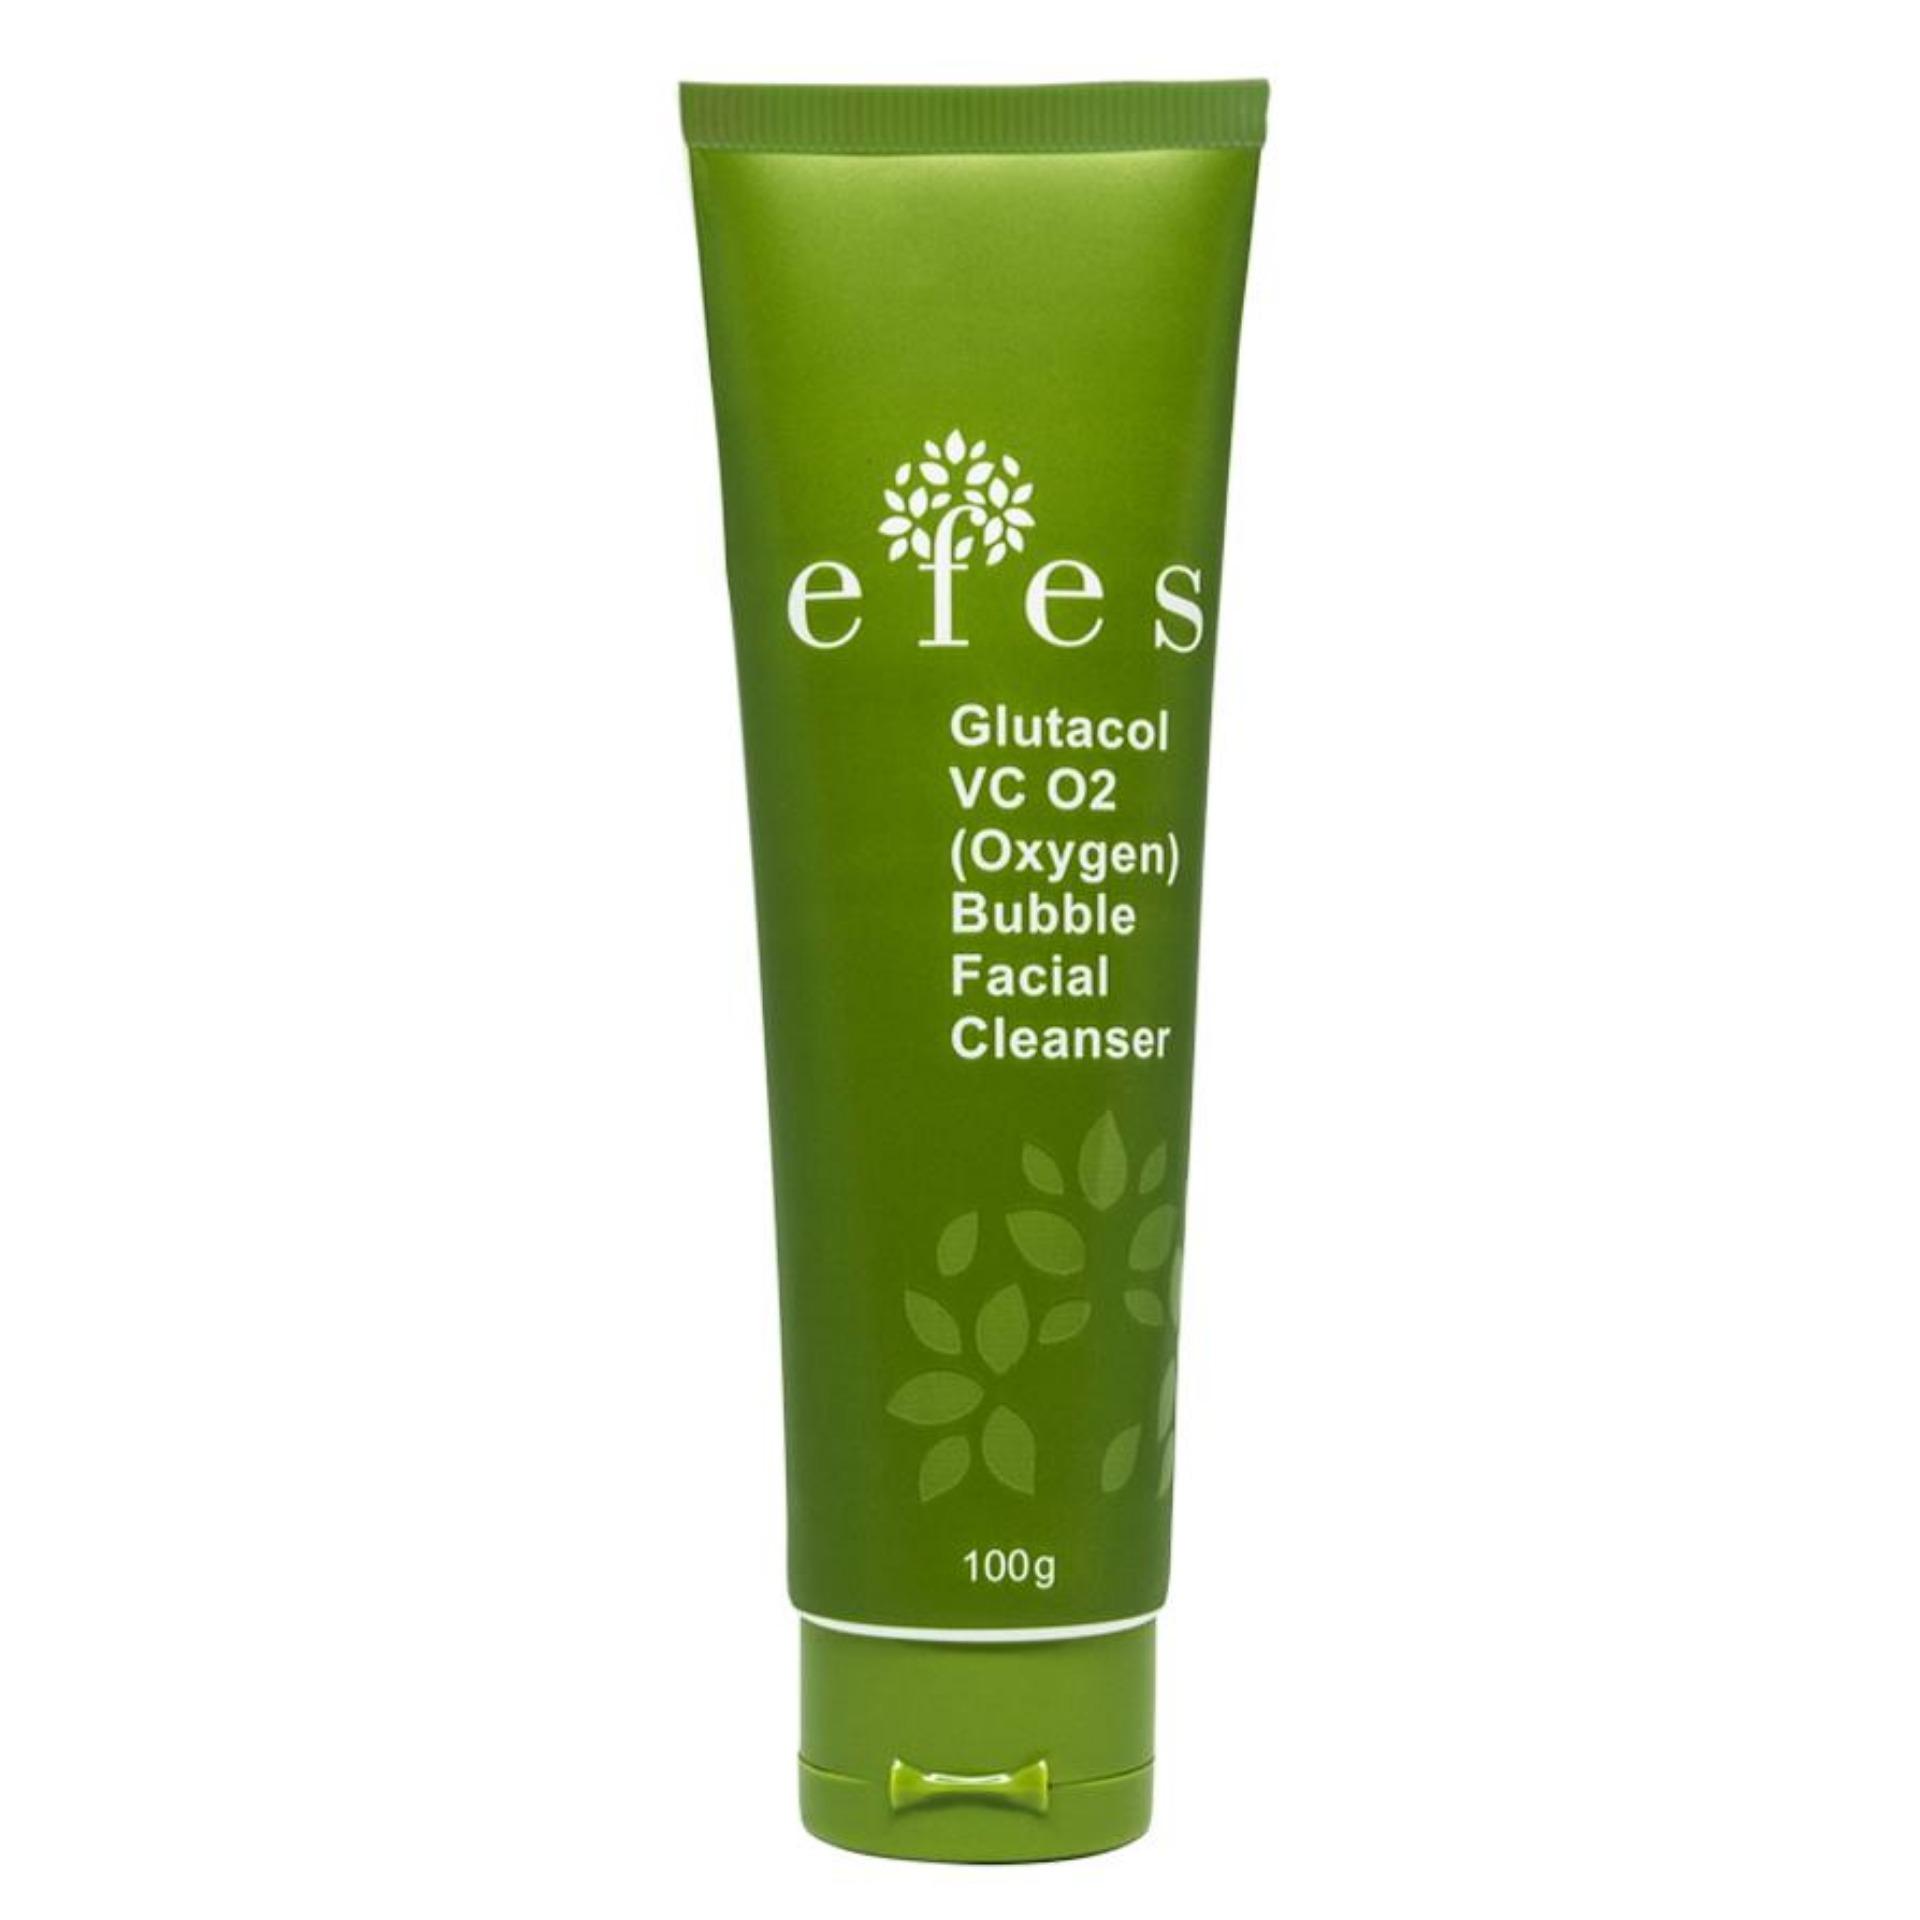 EFES Glutacol VC O2 (Oxygen) Bubble Facial Cleanser